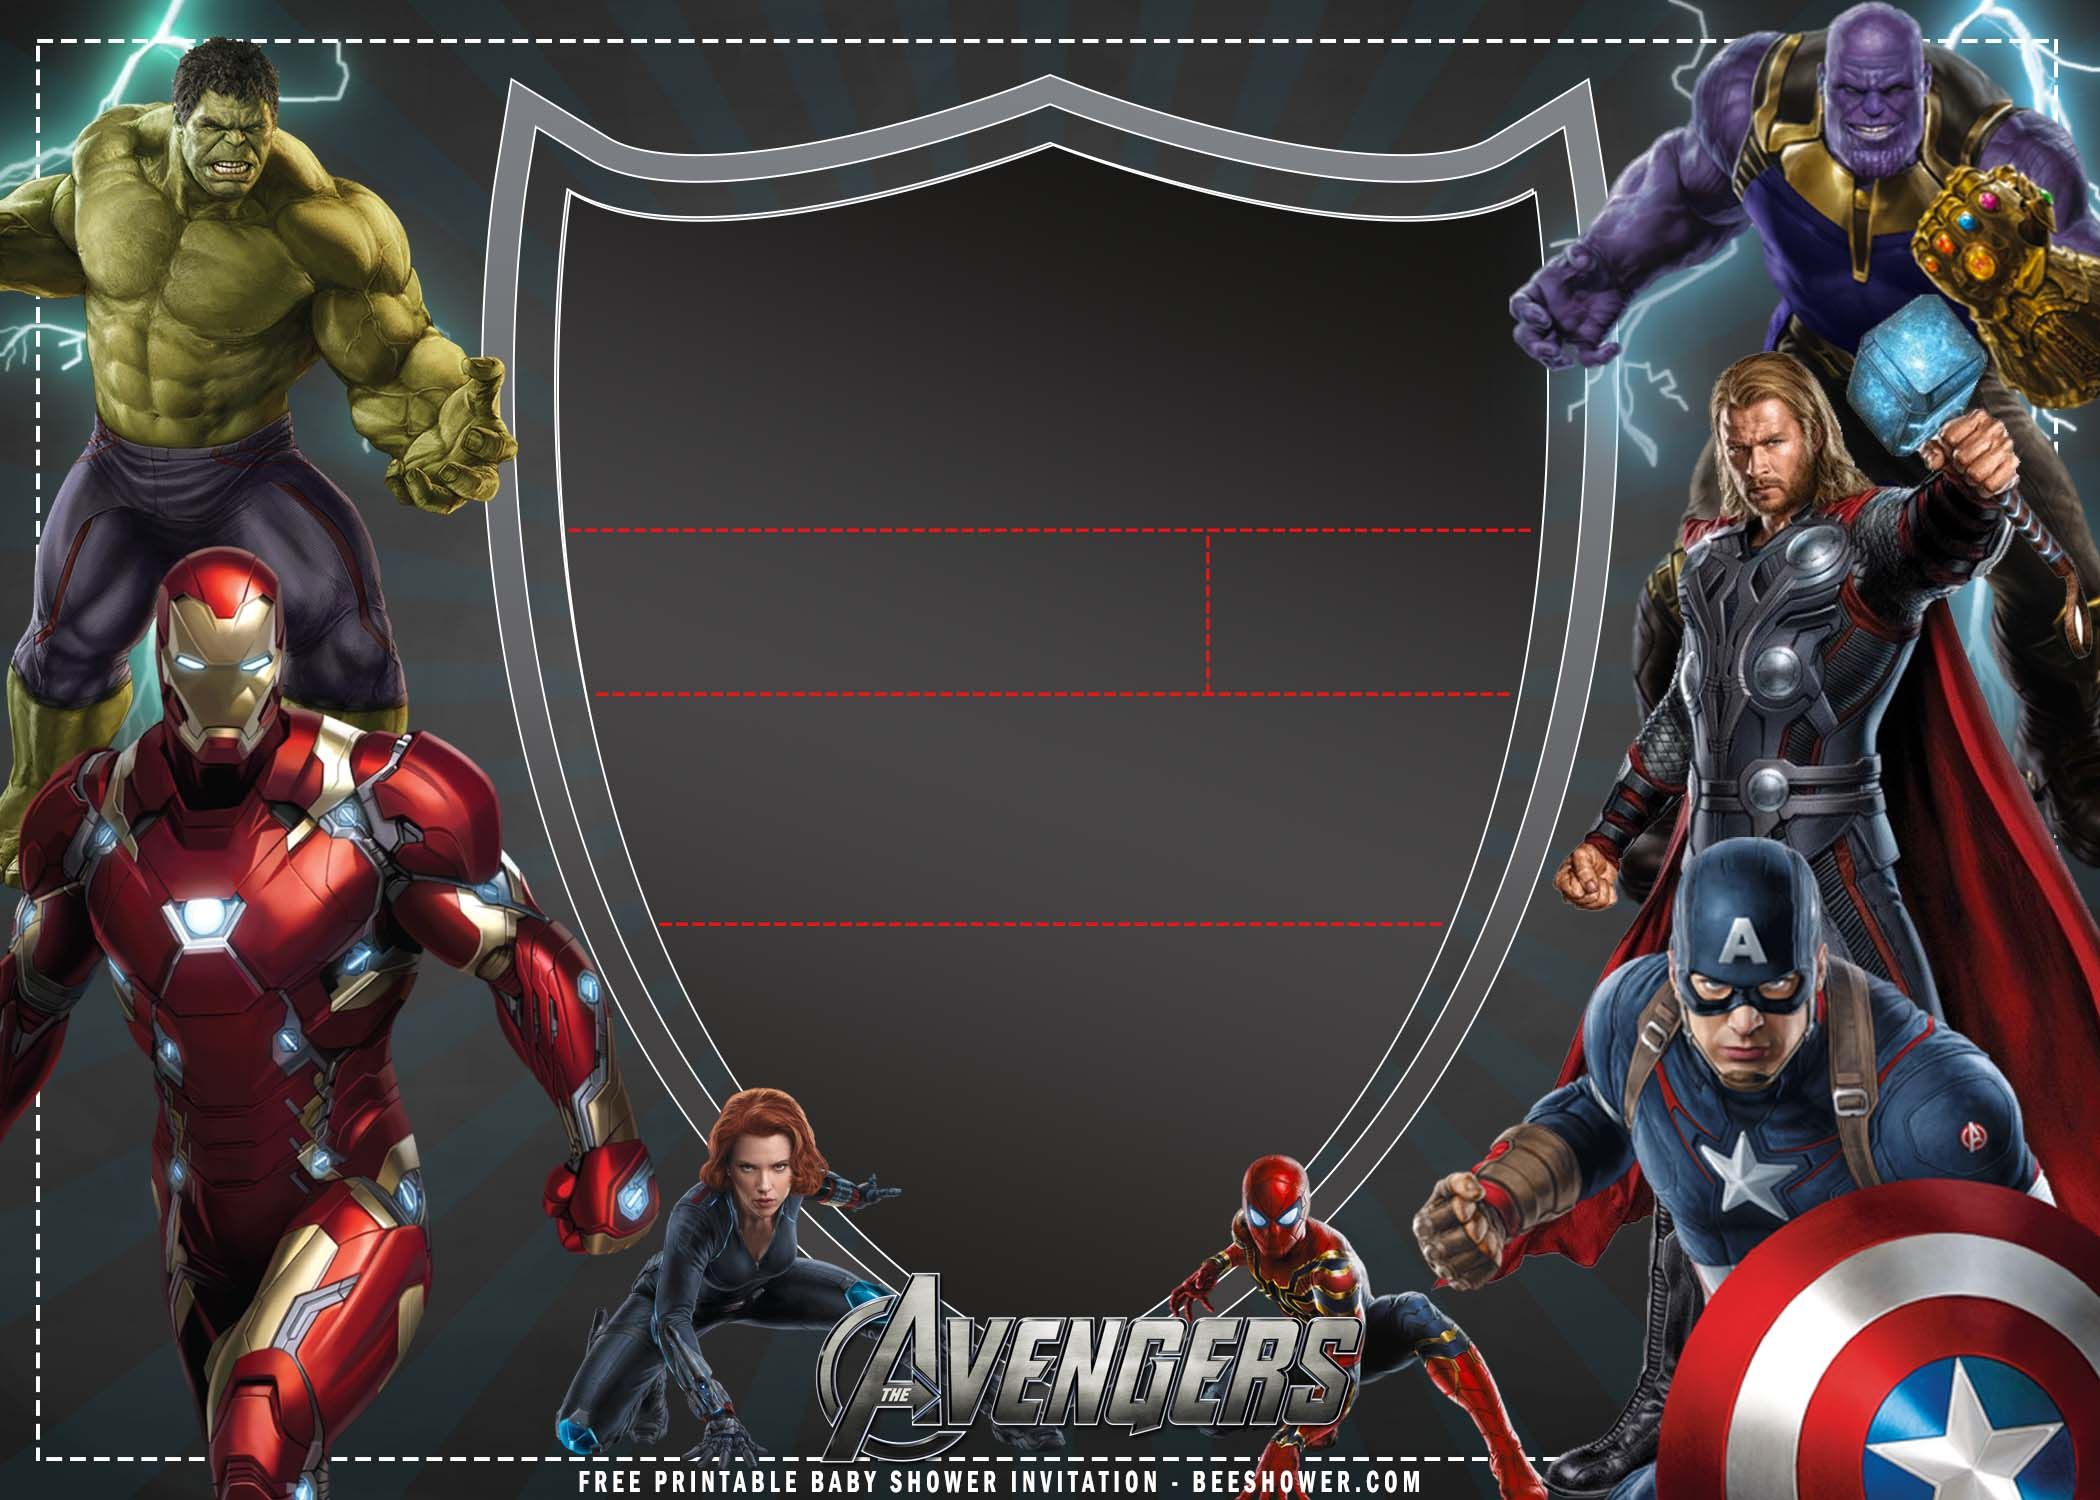 Free Printable Avengers Birthday Party Invitation Templates Avengers Birthday Party Invite Template Avengers Party Invitation